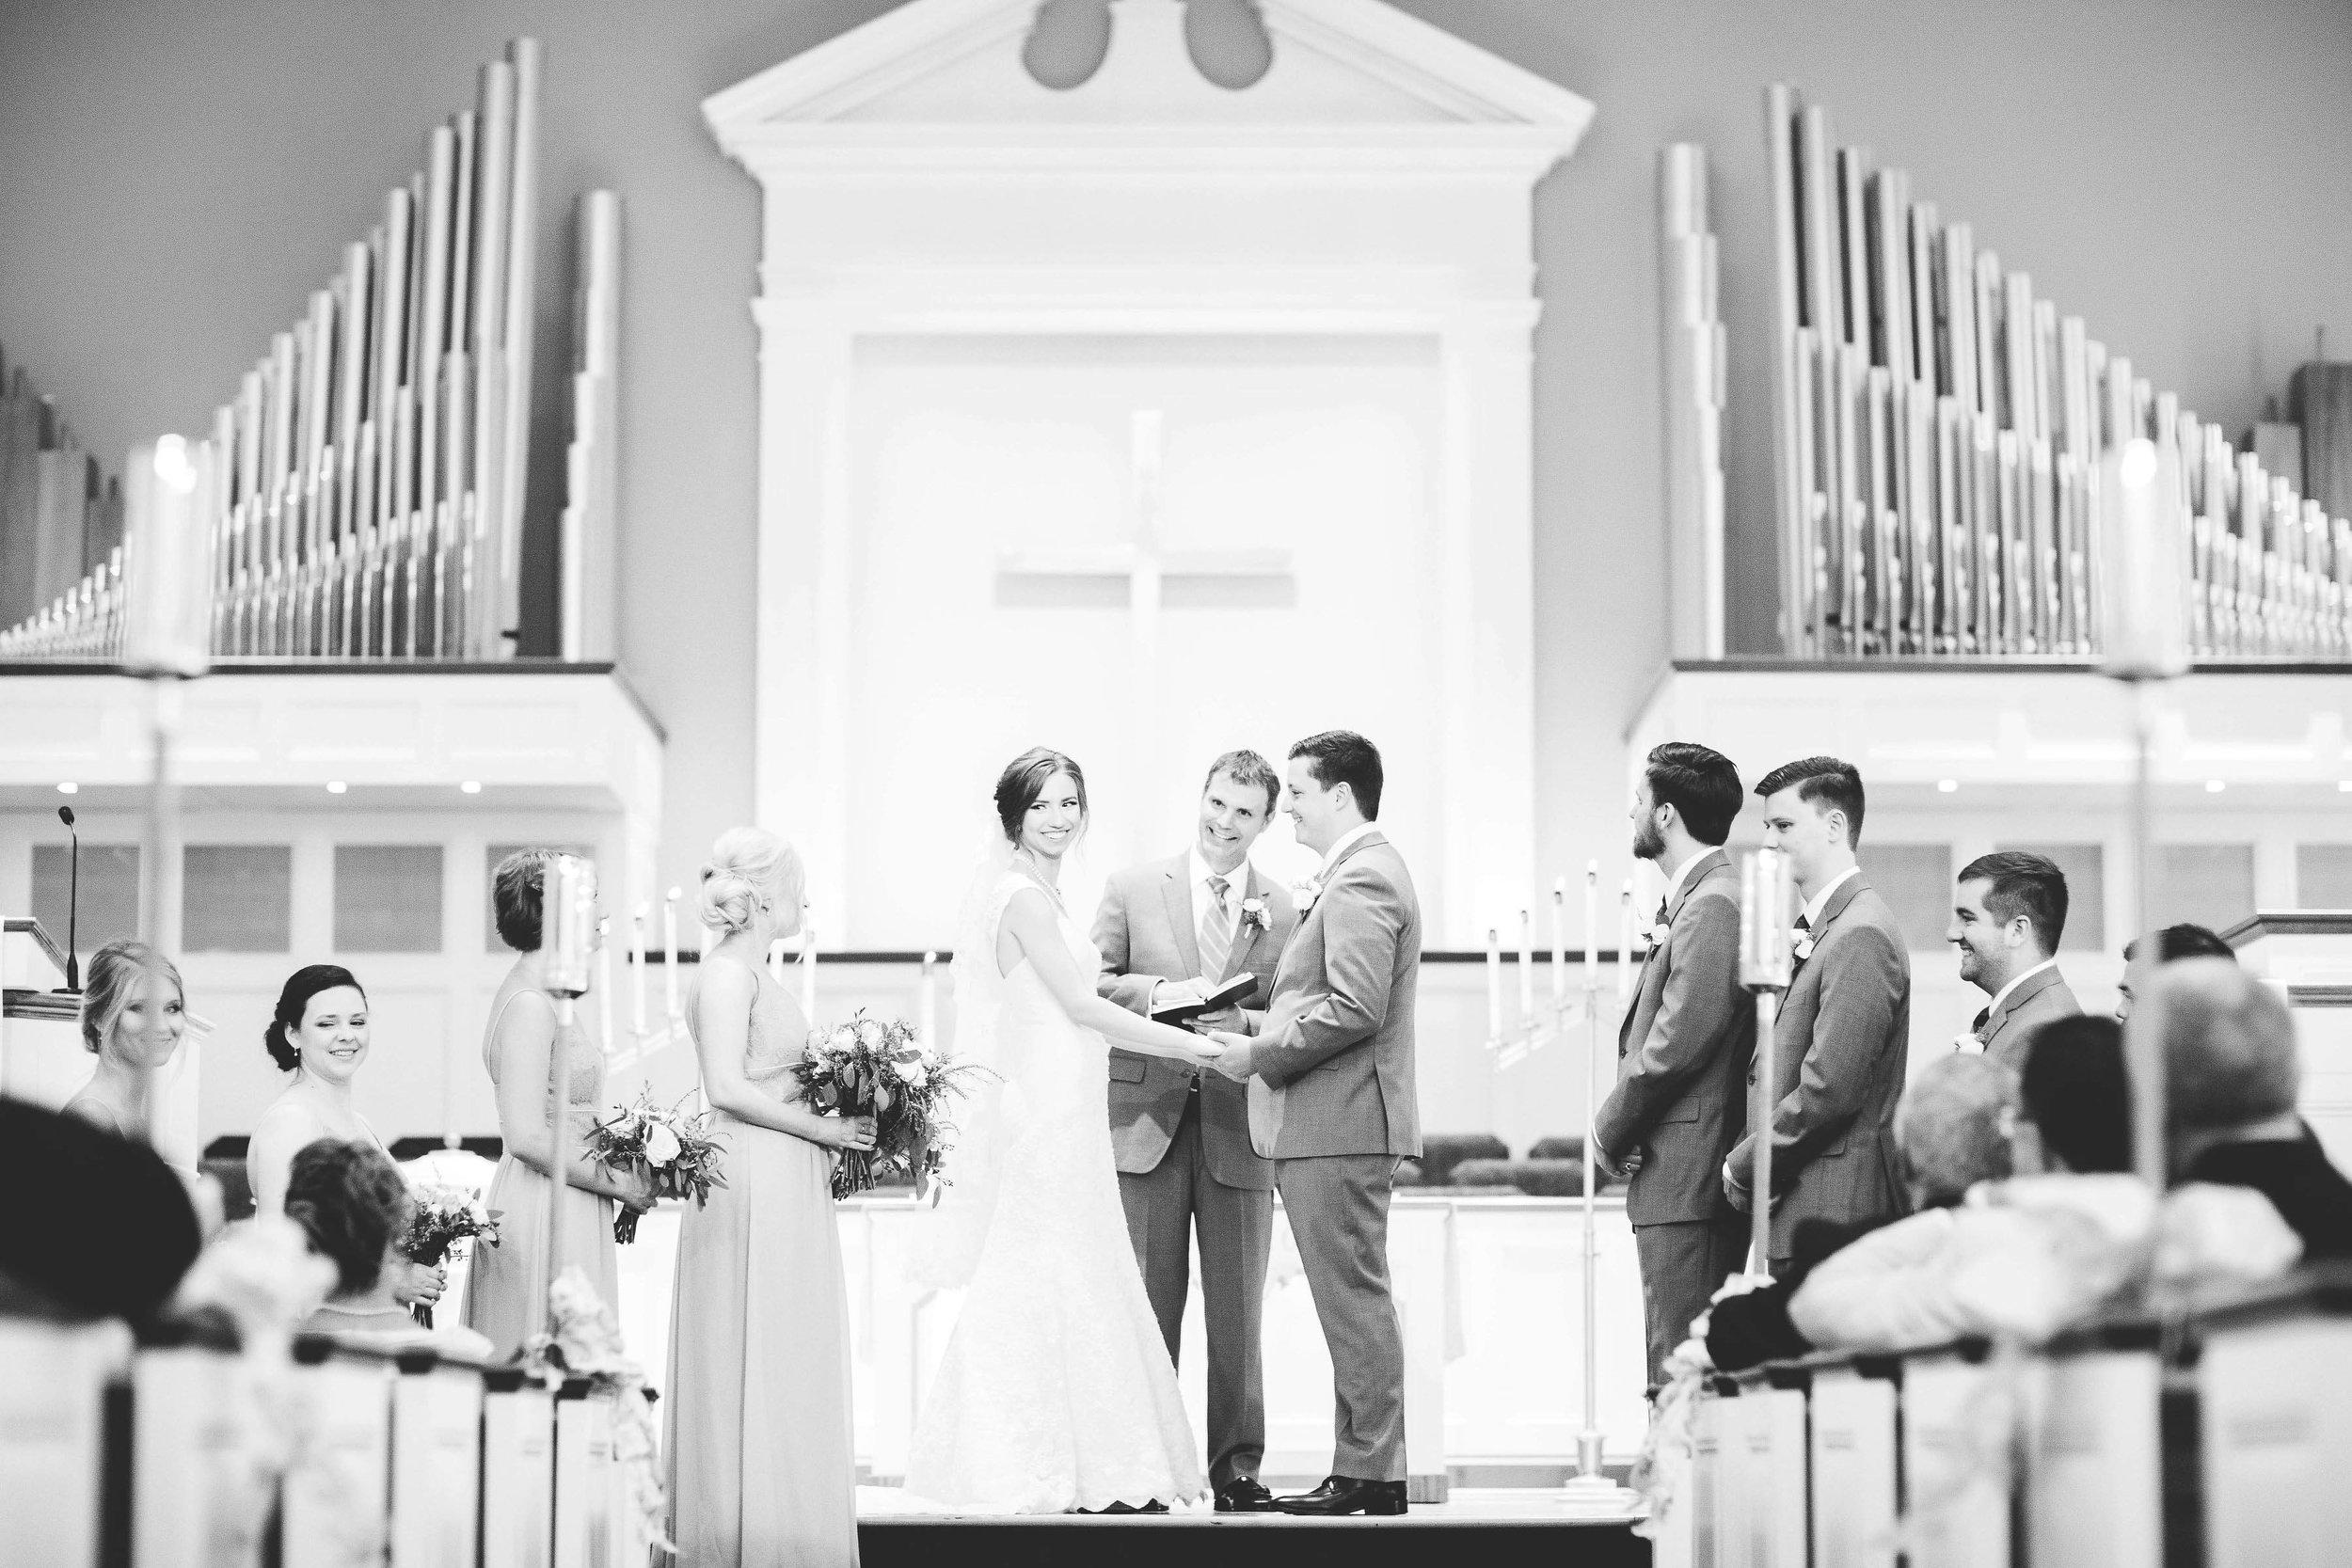 anderson hills united methodist church wedding cincinnati ohio-4.jpg